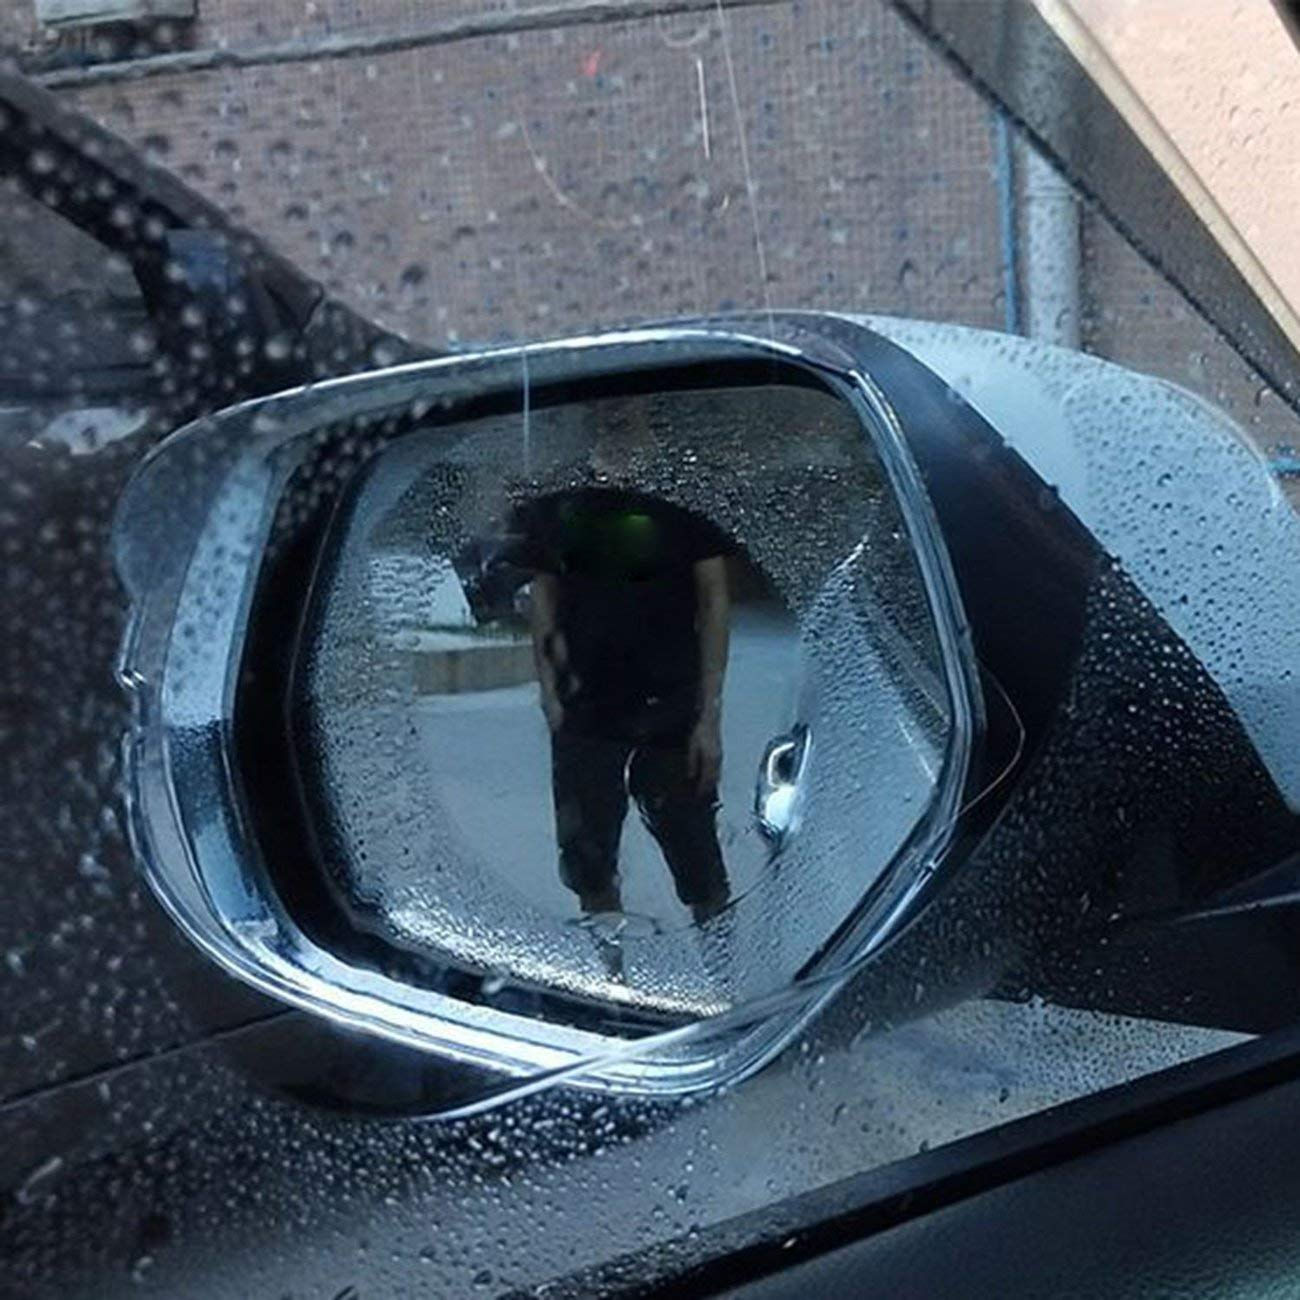 Transparent/&100x145mm Car Rearview Mirror Film Anti-Water Anti-Fog Mirror Film for Car Rainproof Waterproof Rearview Mirror Window Clear Film